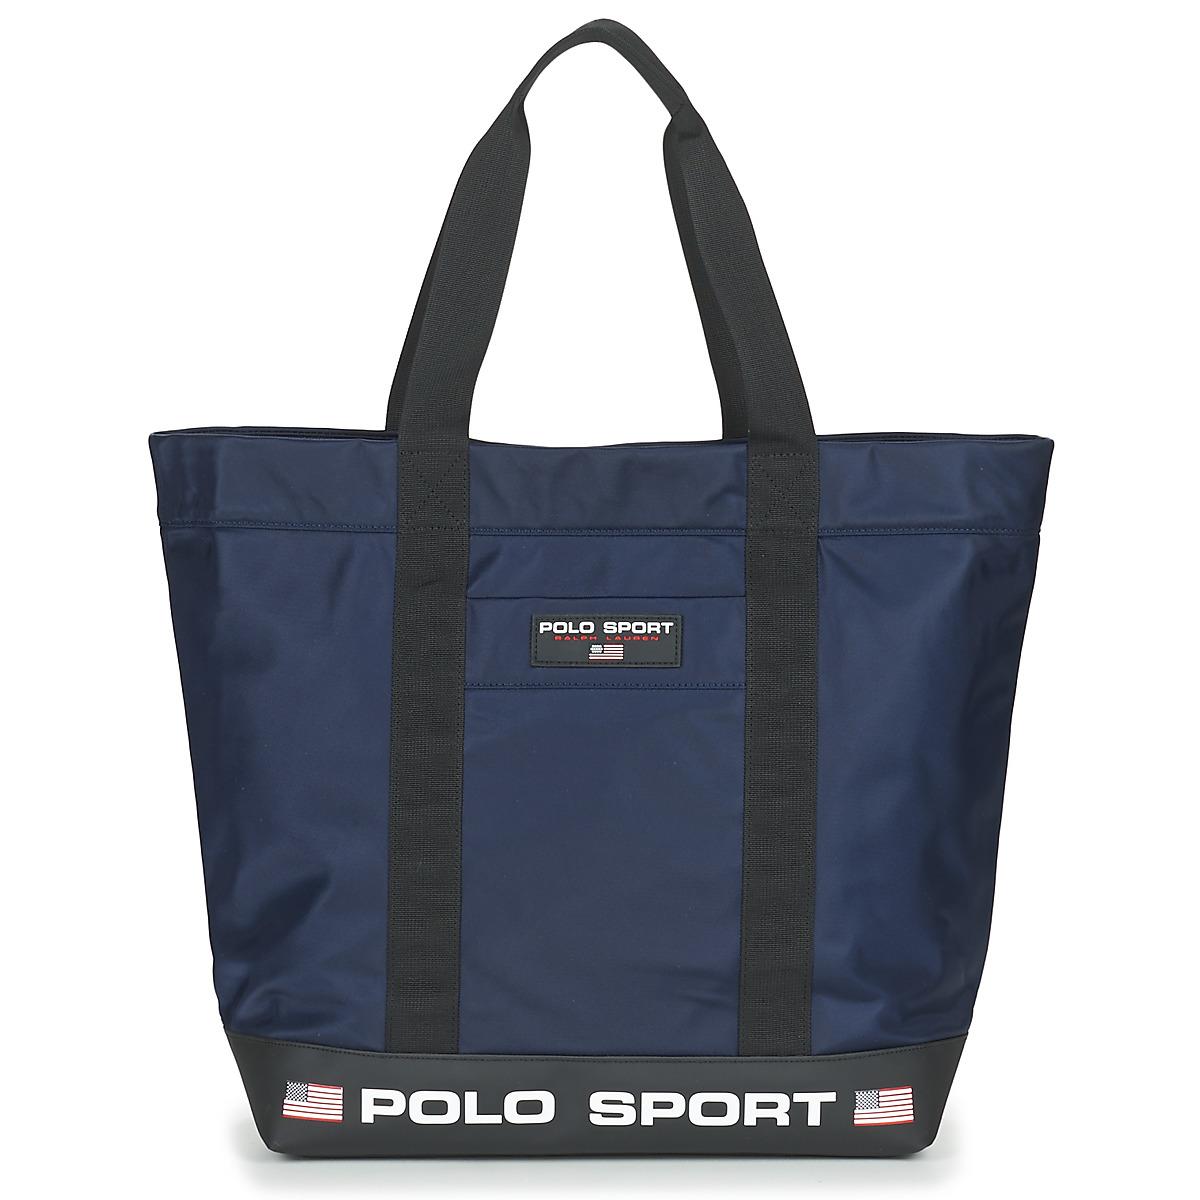 d73d10db8b Borsa Shopping donna Polo Ralph Lauren P SPRT TOTE-TOTE-NYLON